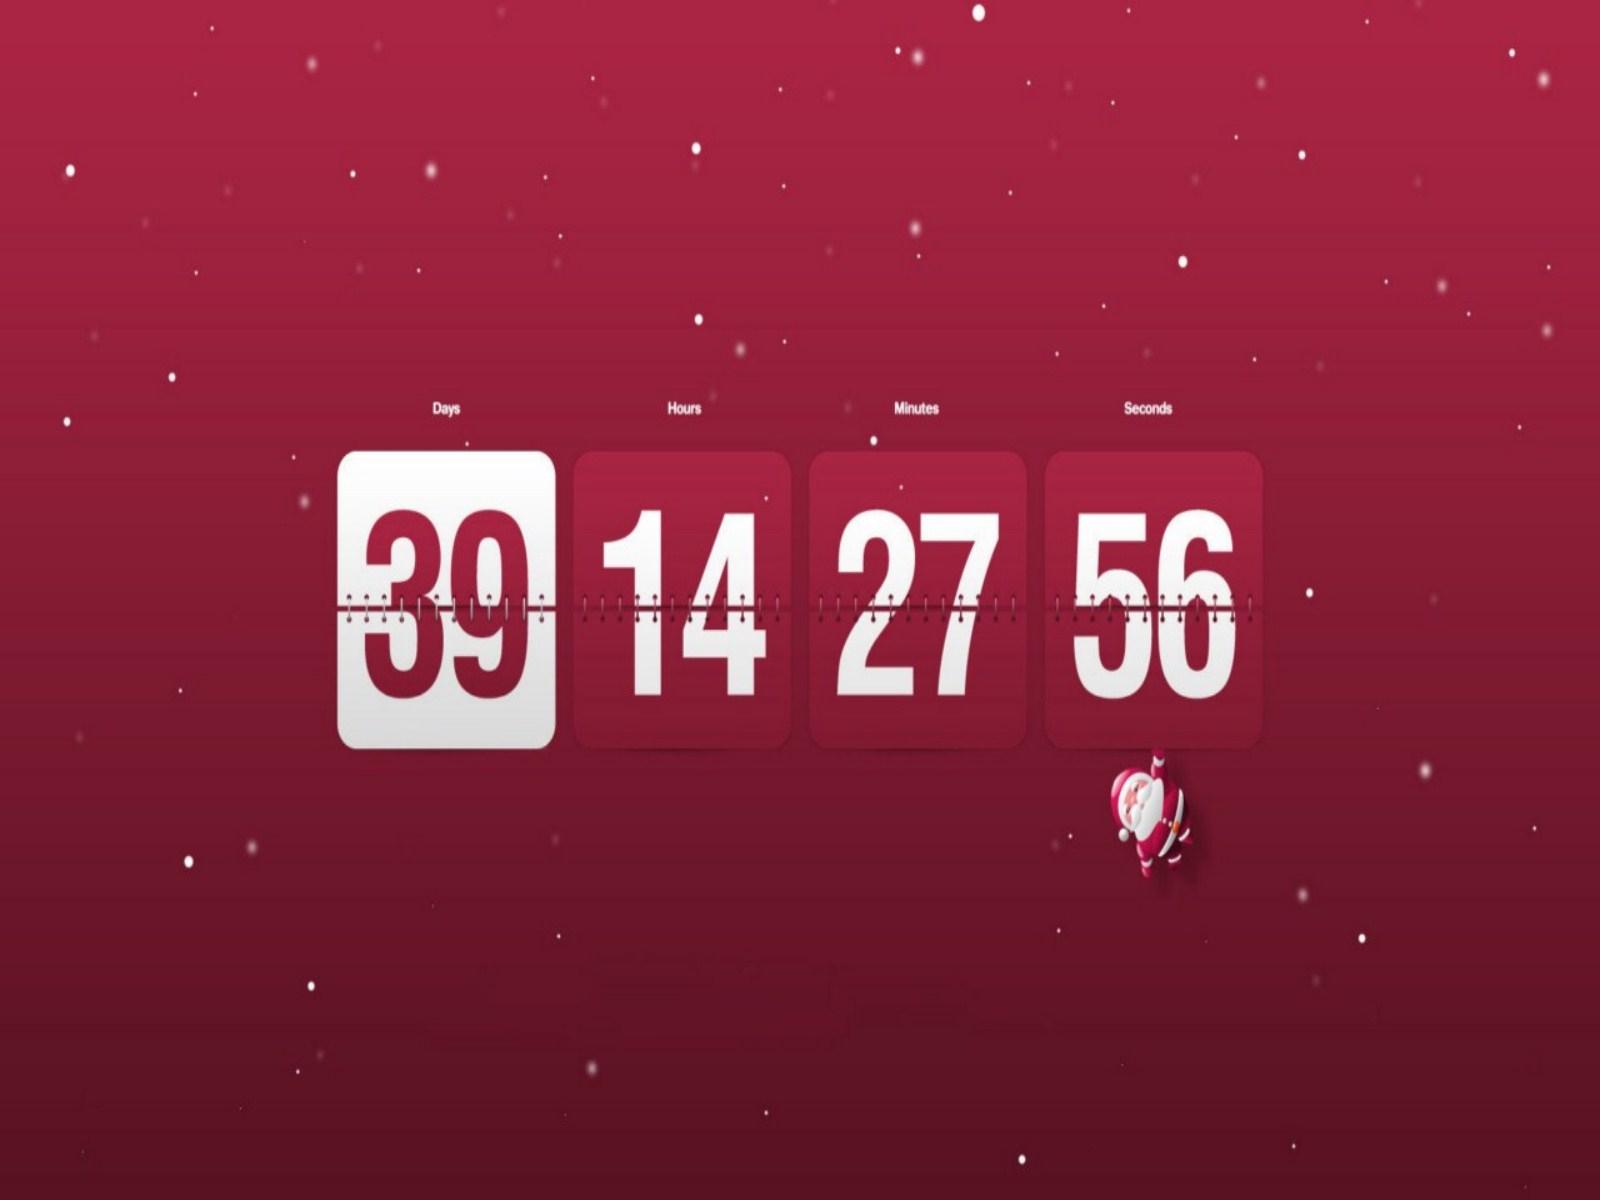 49+] Desktop Wallpaper Countdown Timer On Wallpapersafari intended for Disney Countdown Widget